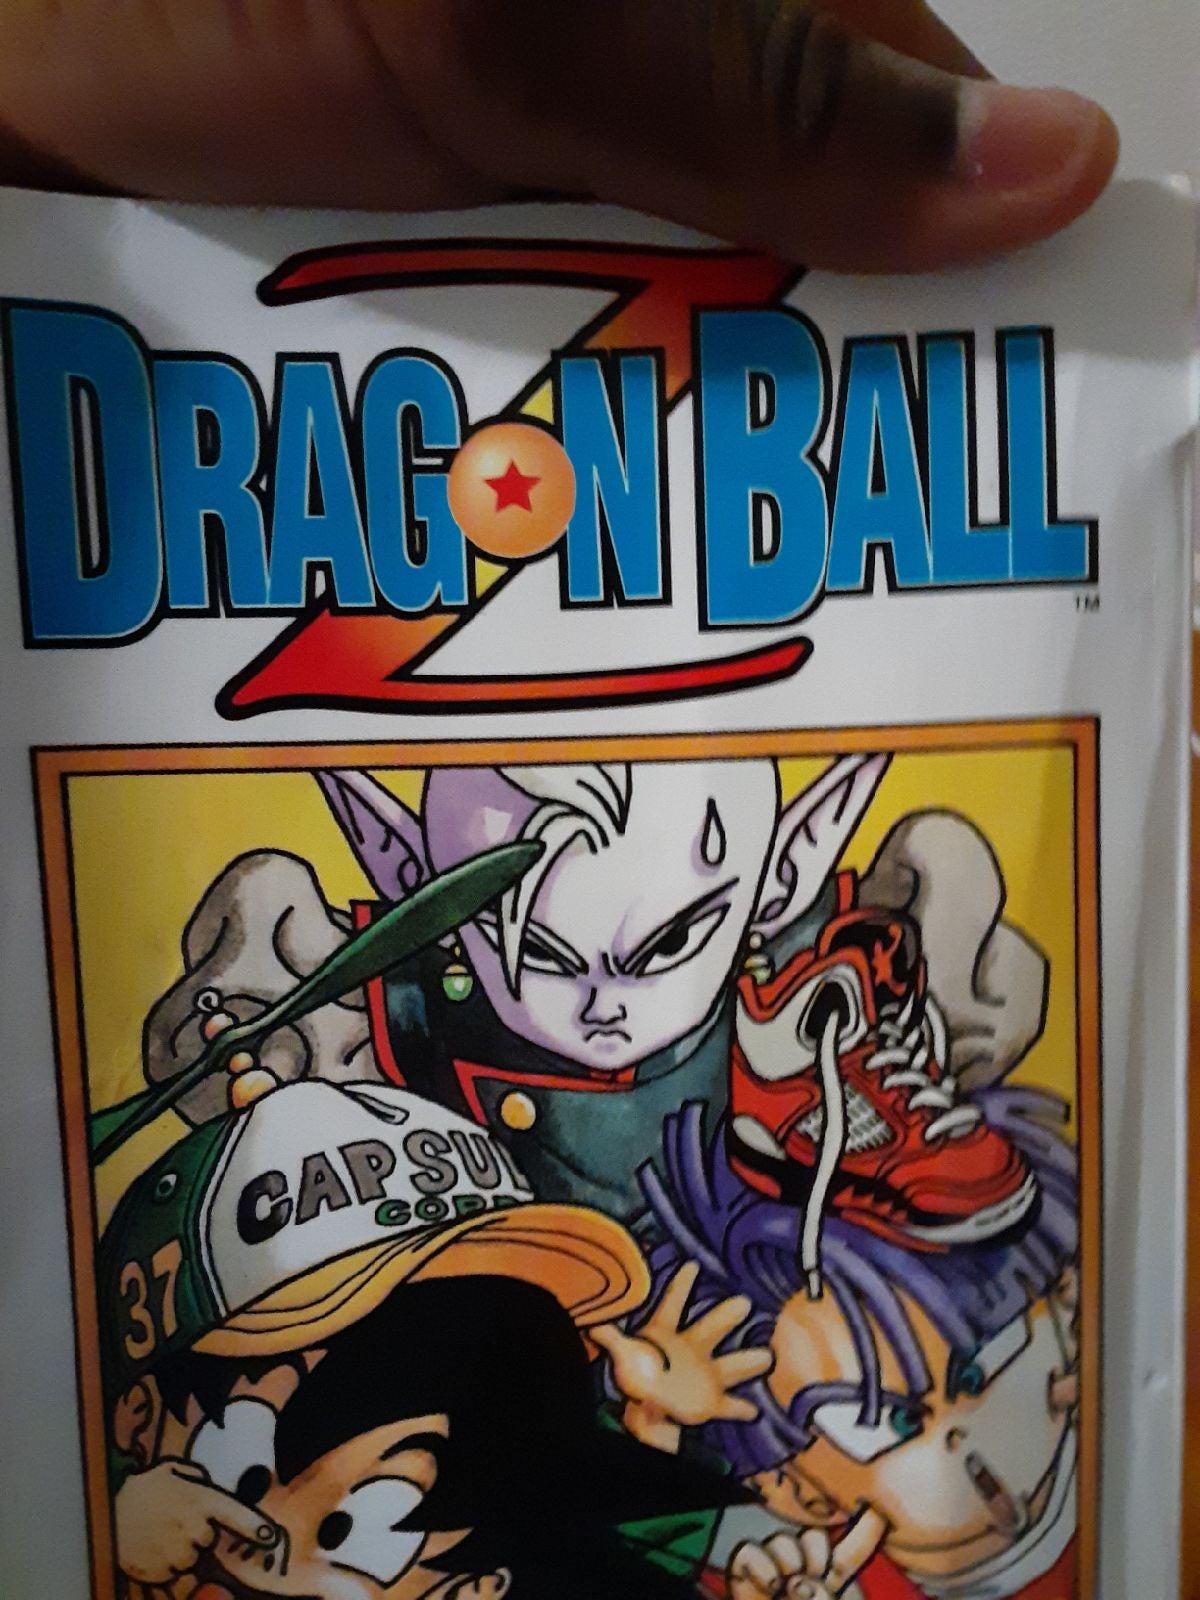 dragonball zbook